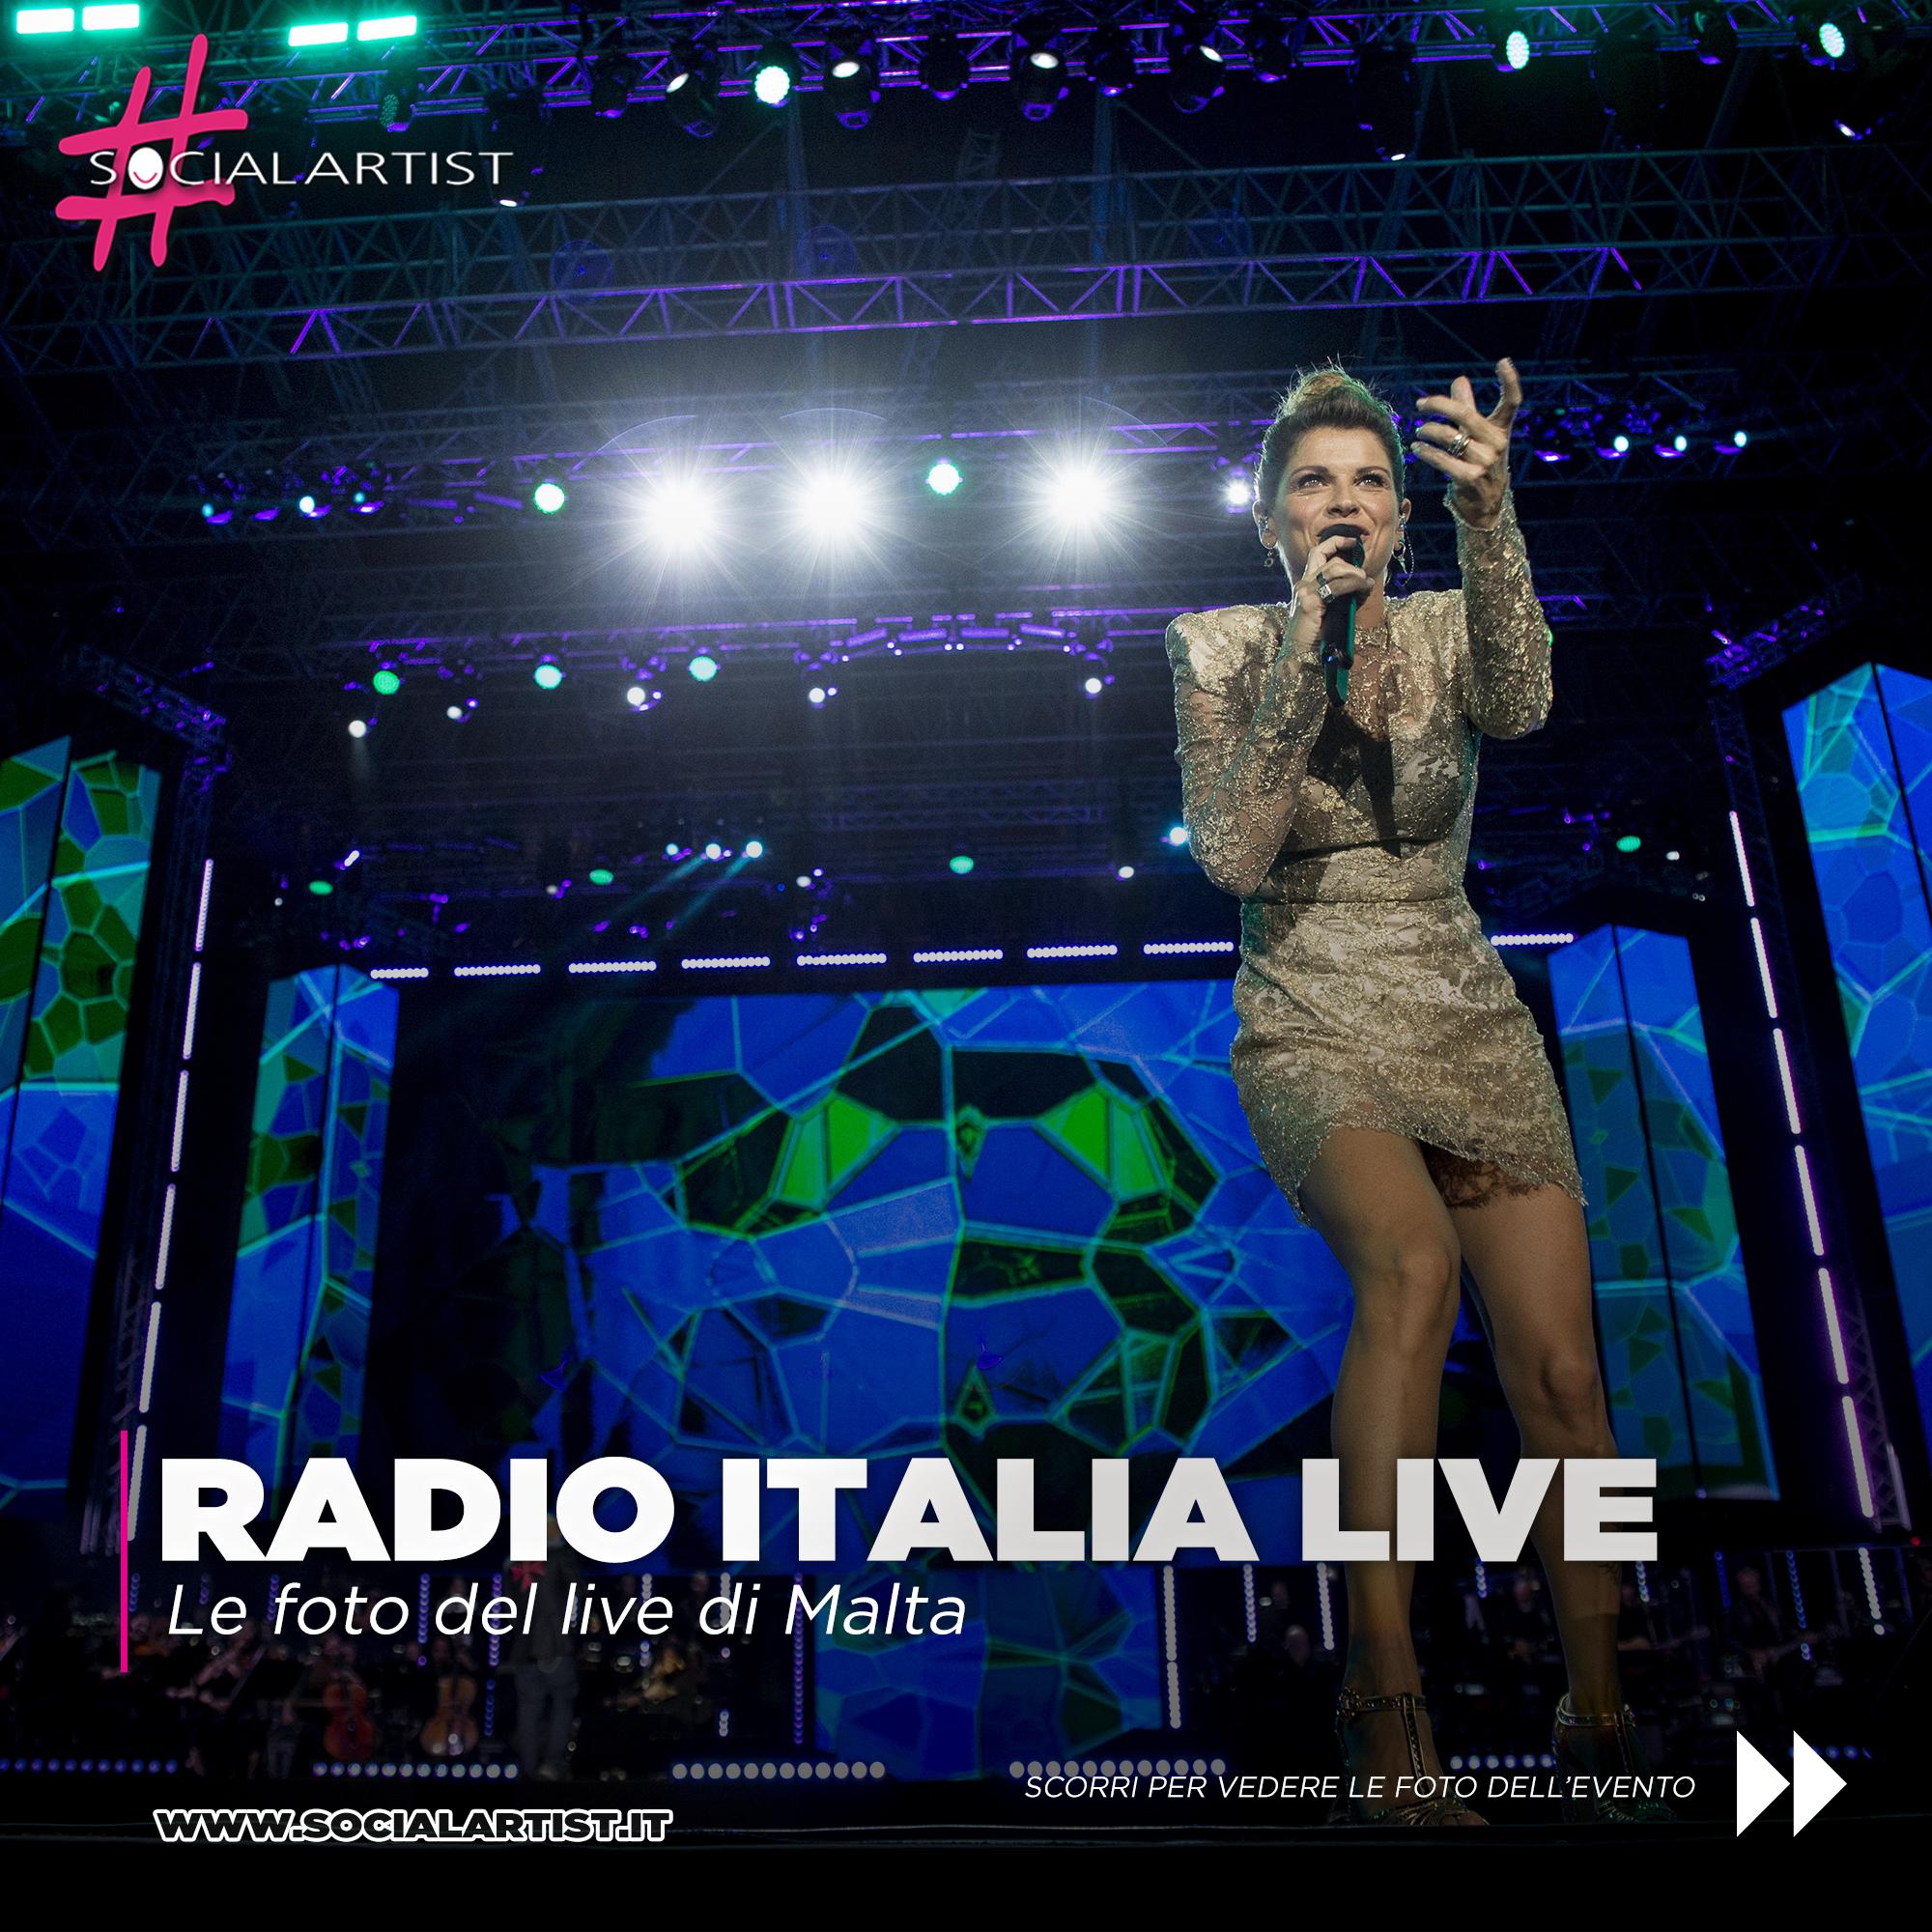 Radio Italia Live Malta